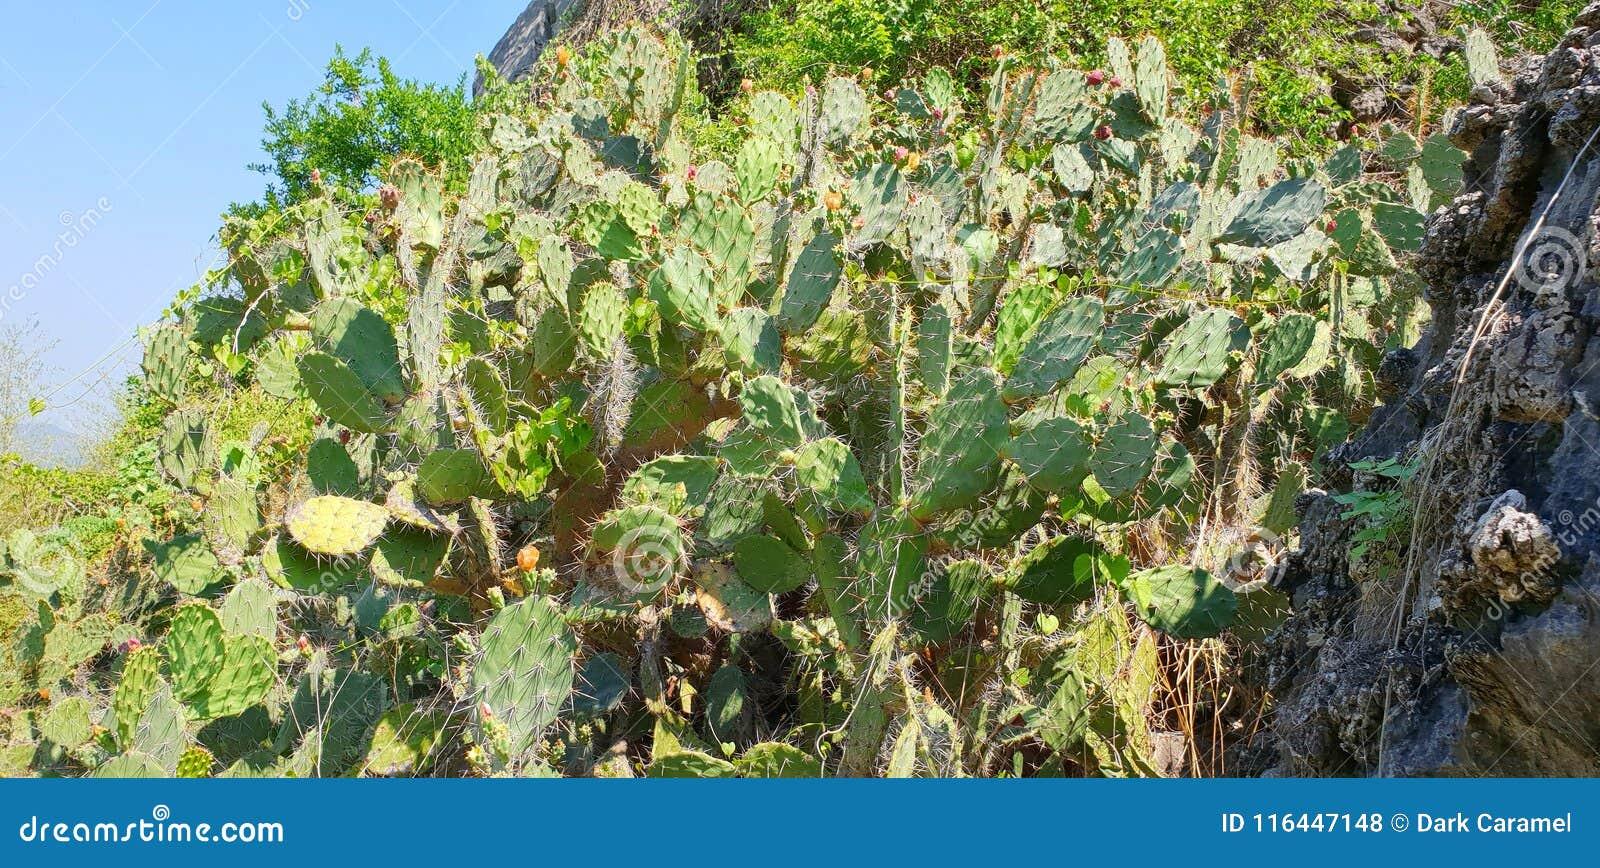 Gruppo del cactus sul fondo del cielo blu spine del cactus,